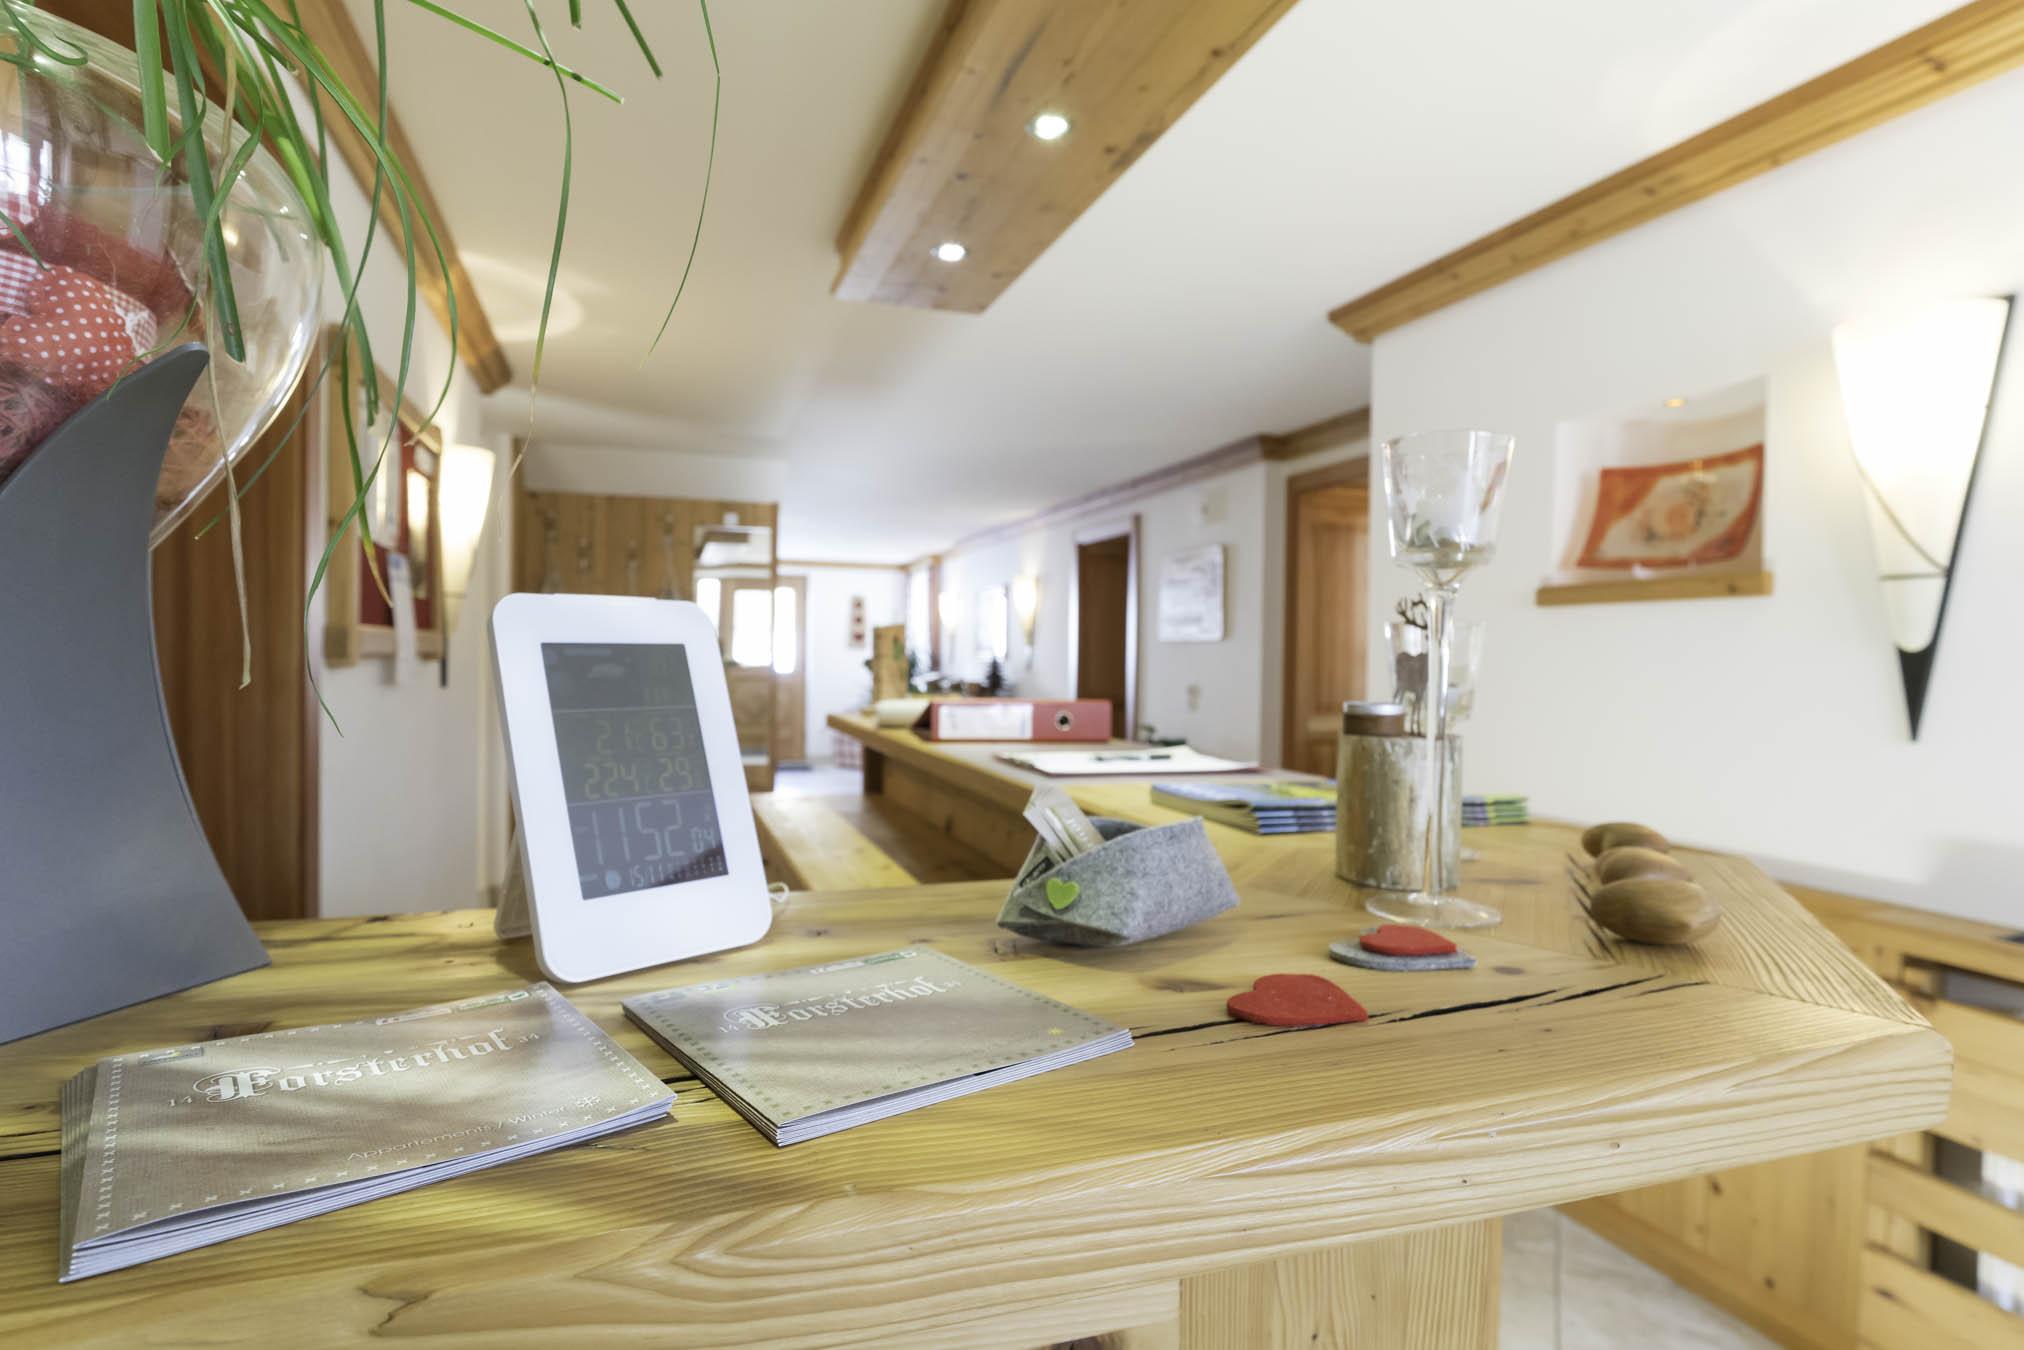 House Interior & Facilities